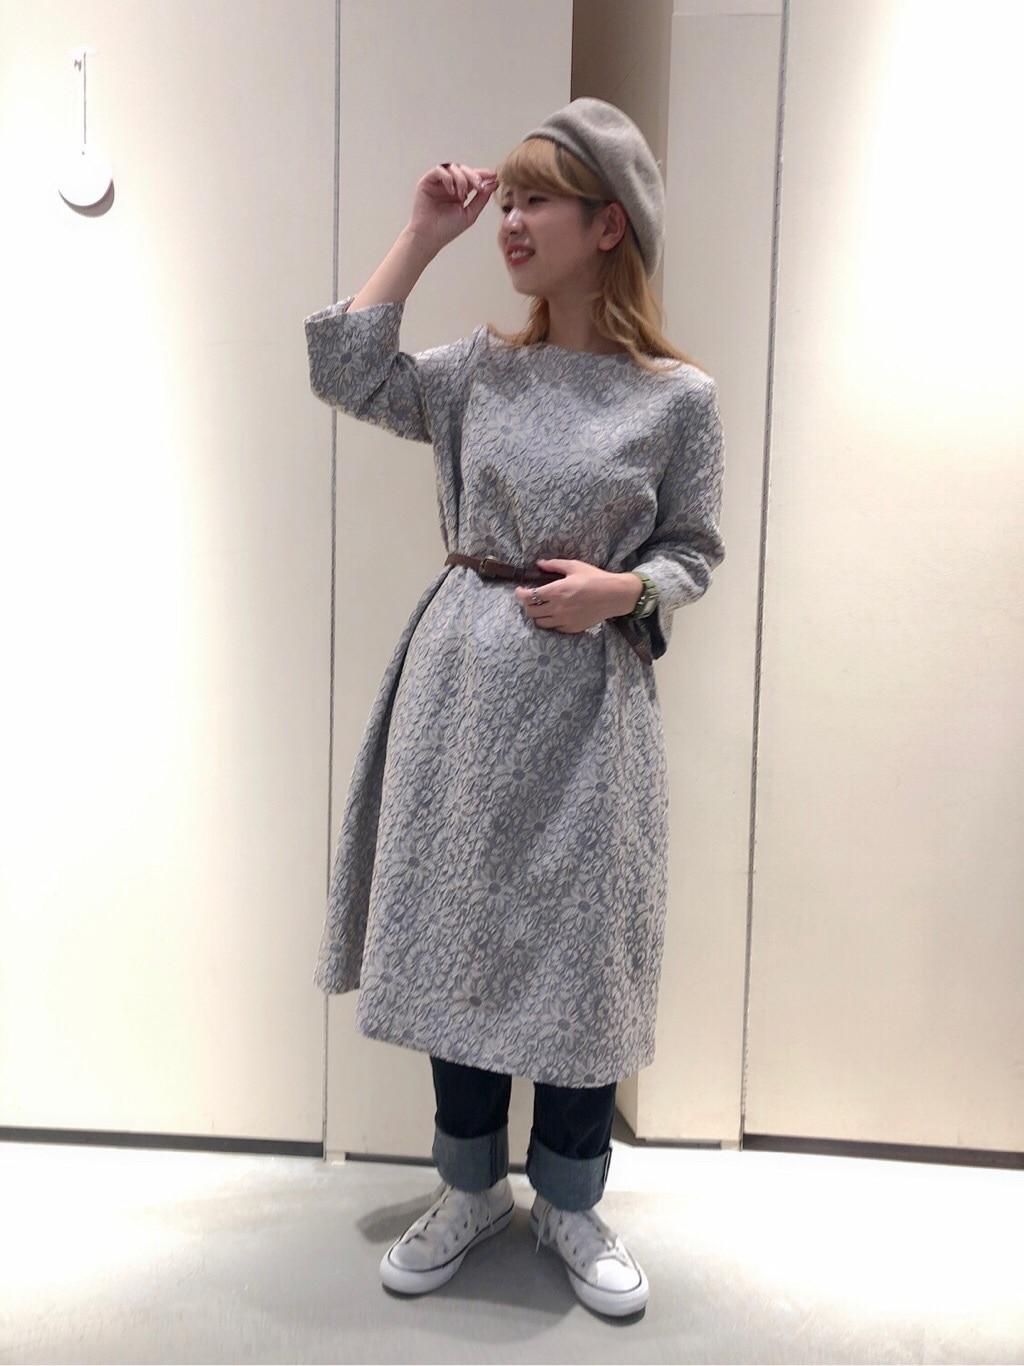 bulle de savon 阪急西宮ガーデンズ 身長:152cm 2019.10.05